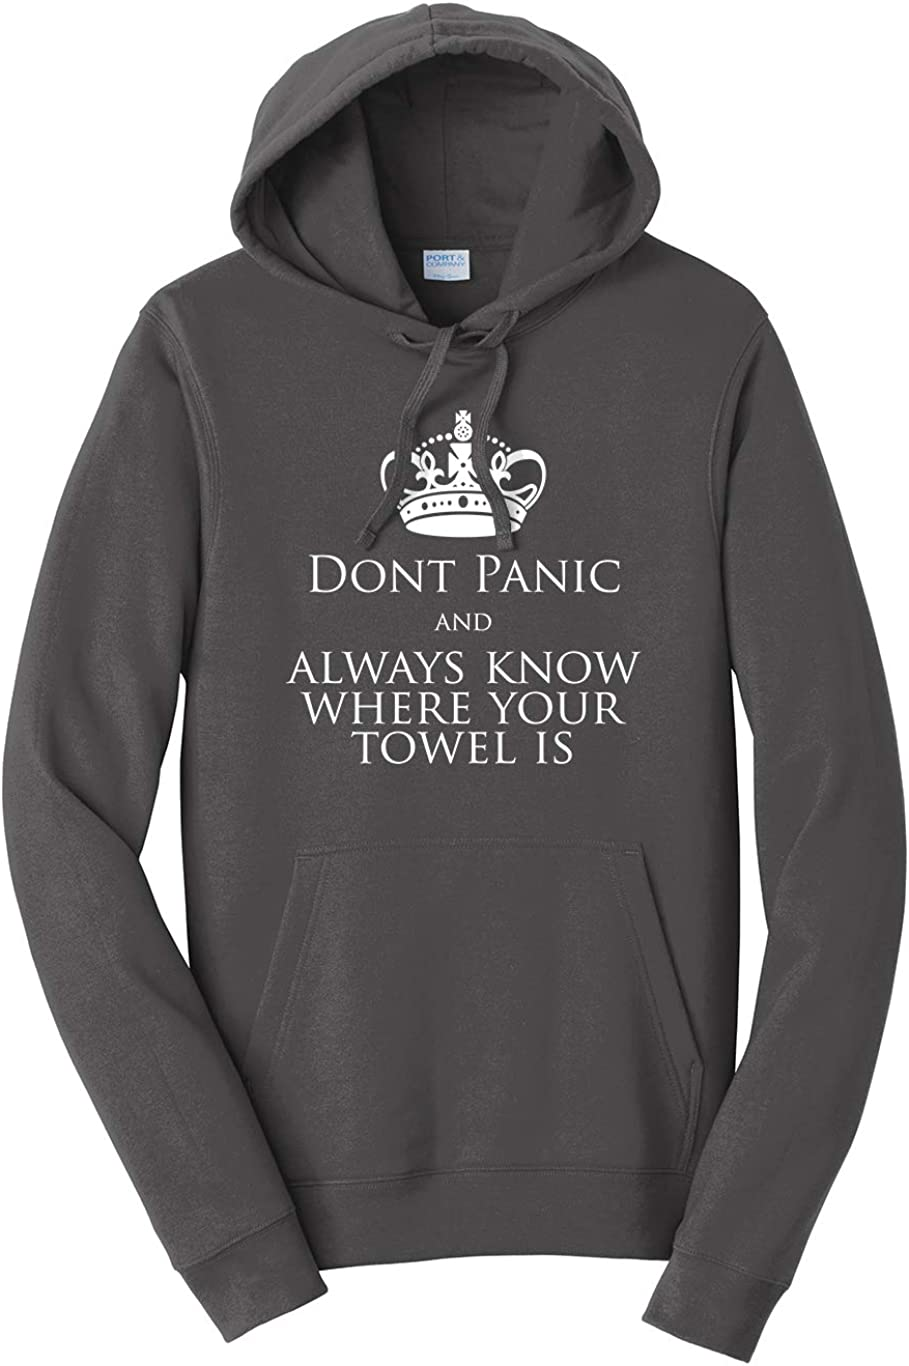 Tenacitee Unisex Always Know Where Your Towel is Hooded Sweatshirt